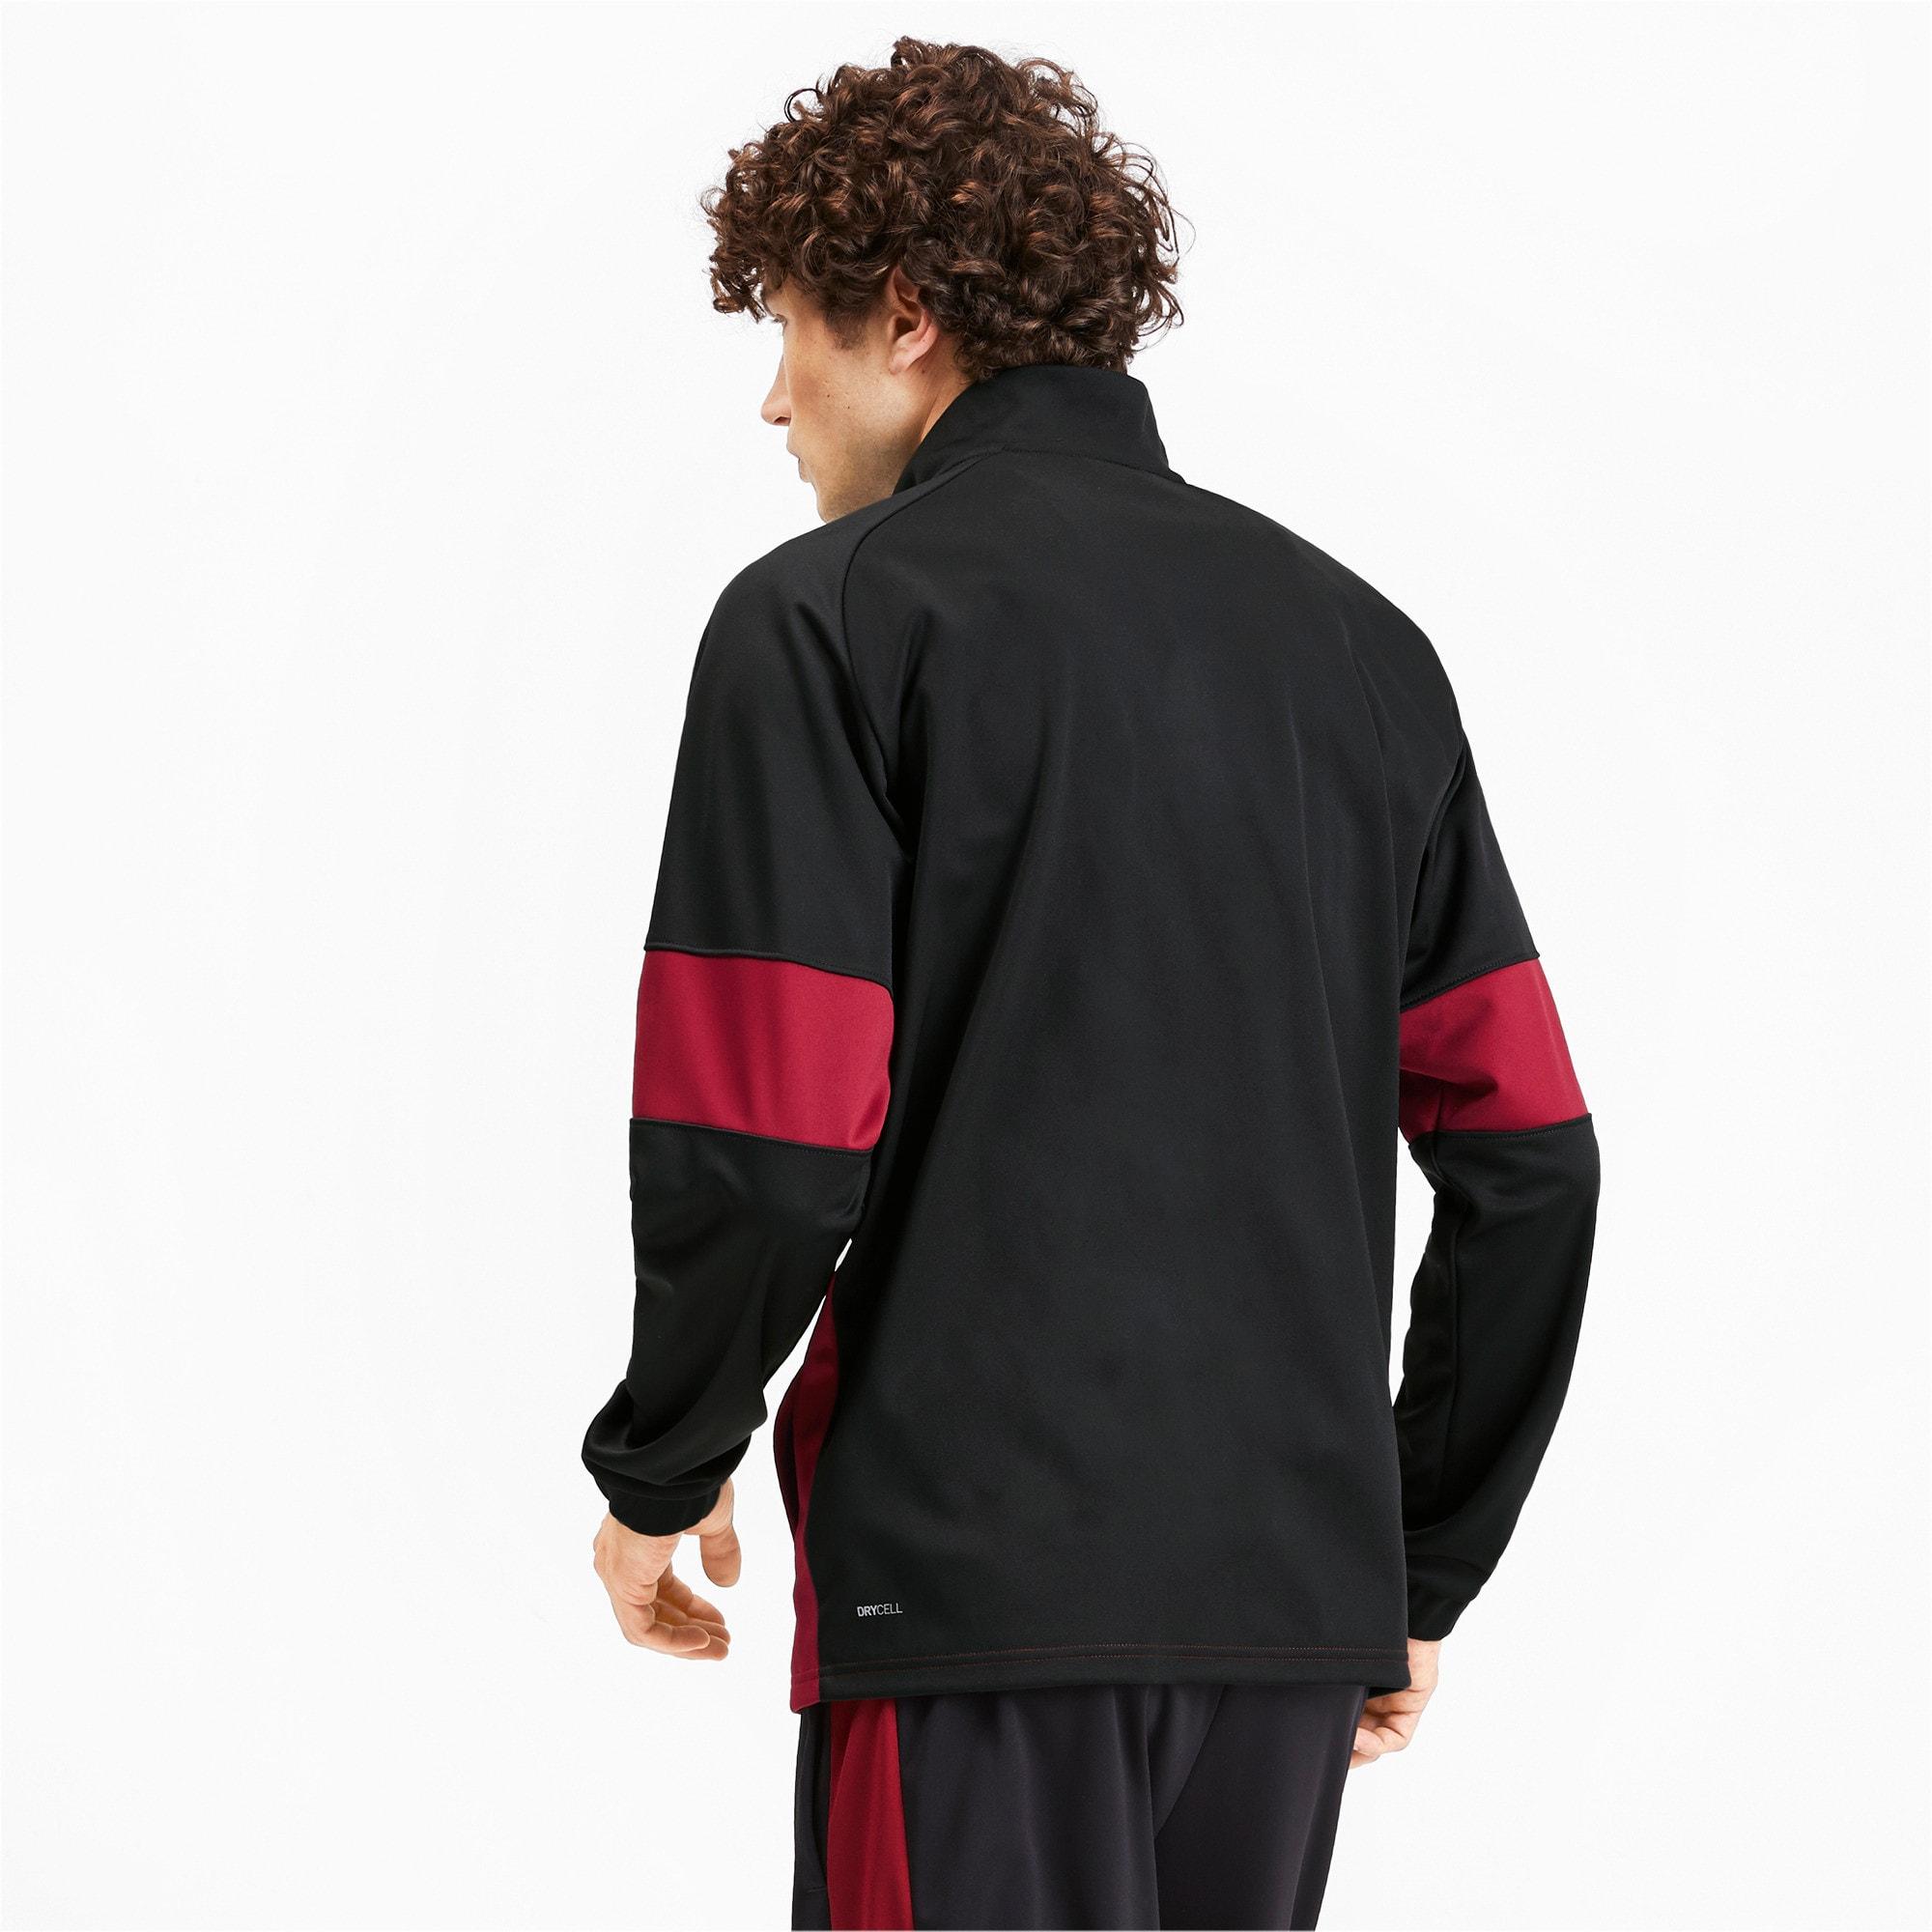 Thumbnail 2 of Blaster Men's Jacket, Puma Black-Rhubarb, medium-IND